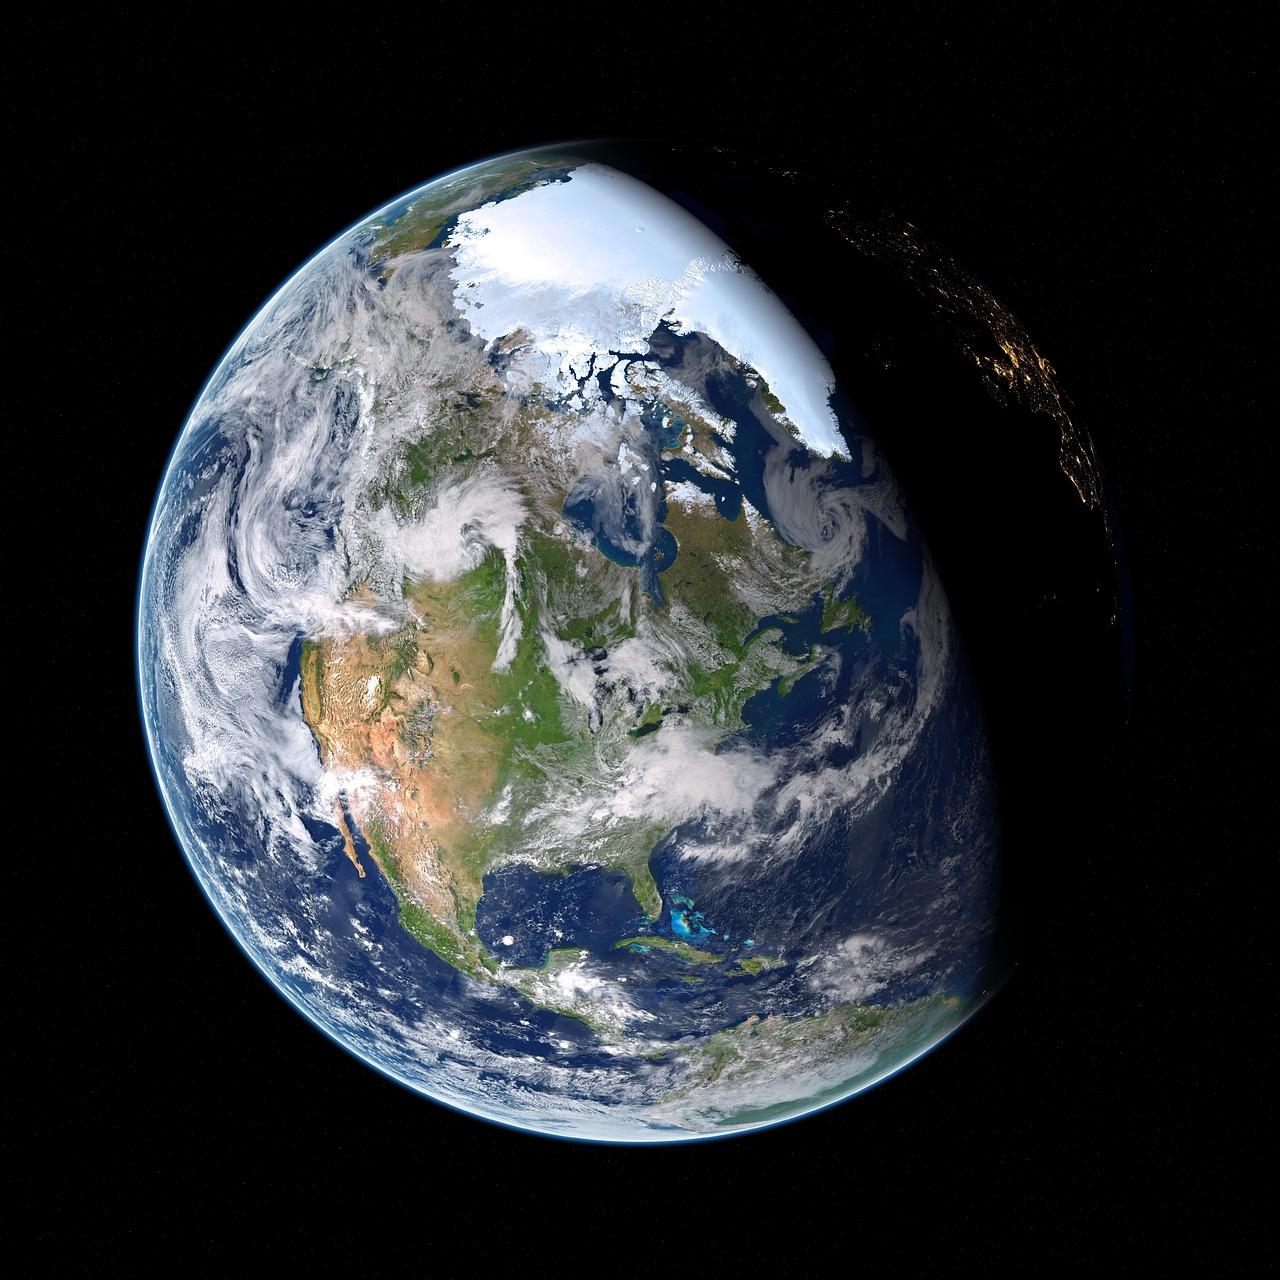 Mother Earth_1280.jpg